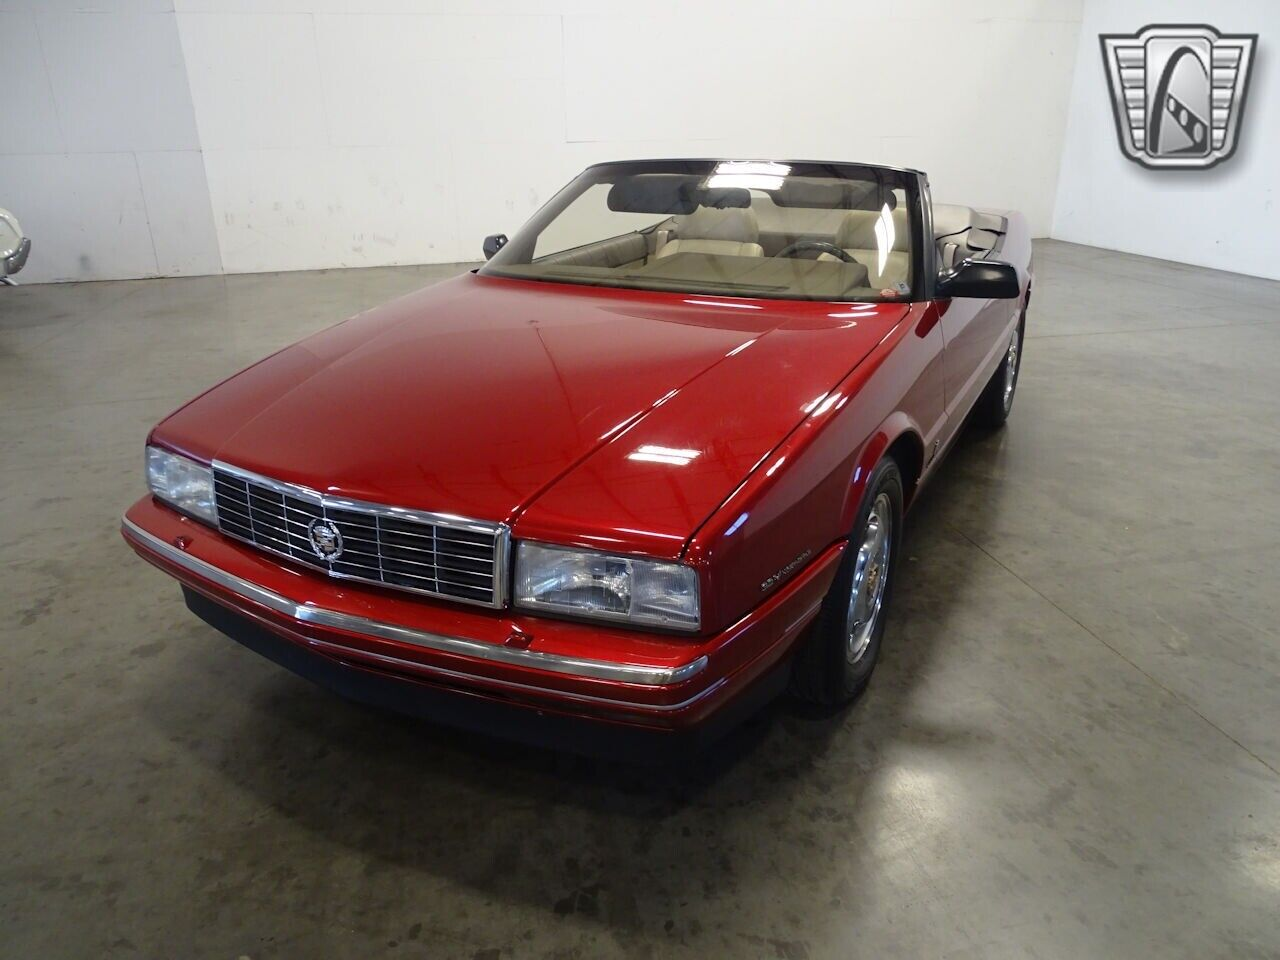 Red 1993 Cadillac Allante Actual Miles, Low Miles 4.6L V8 F DOHC 32V 4 Speed Aut